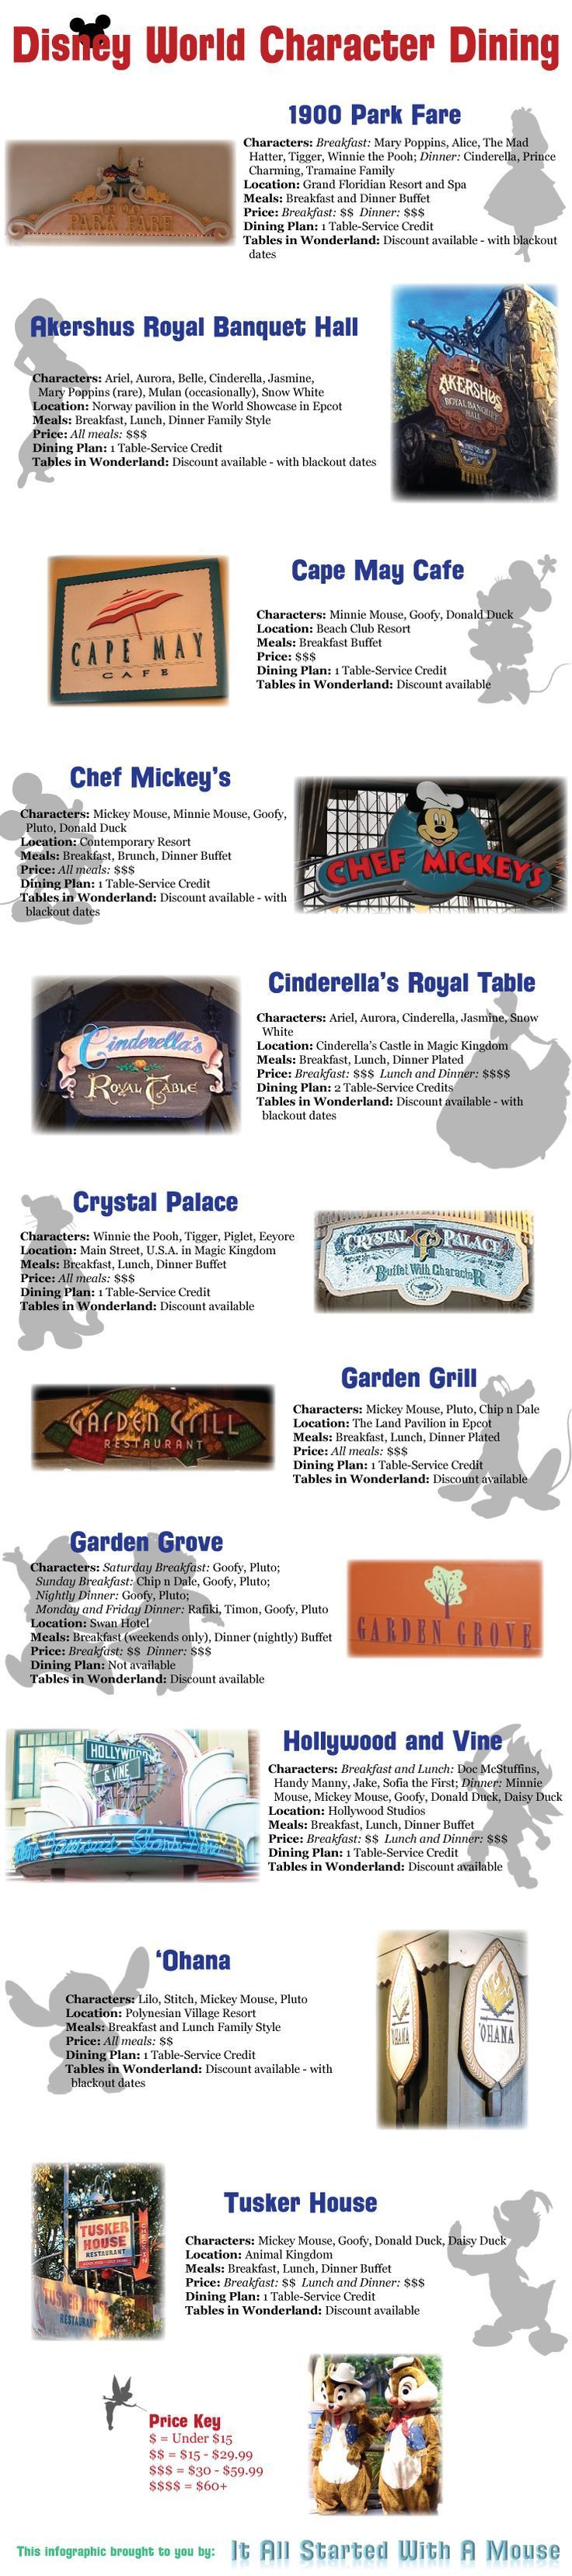 Disney World Character Dining Overview www.thepixieplanner #thepixieplanner